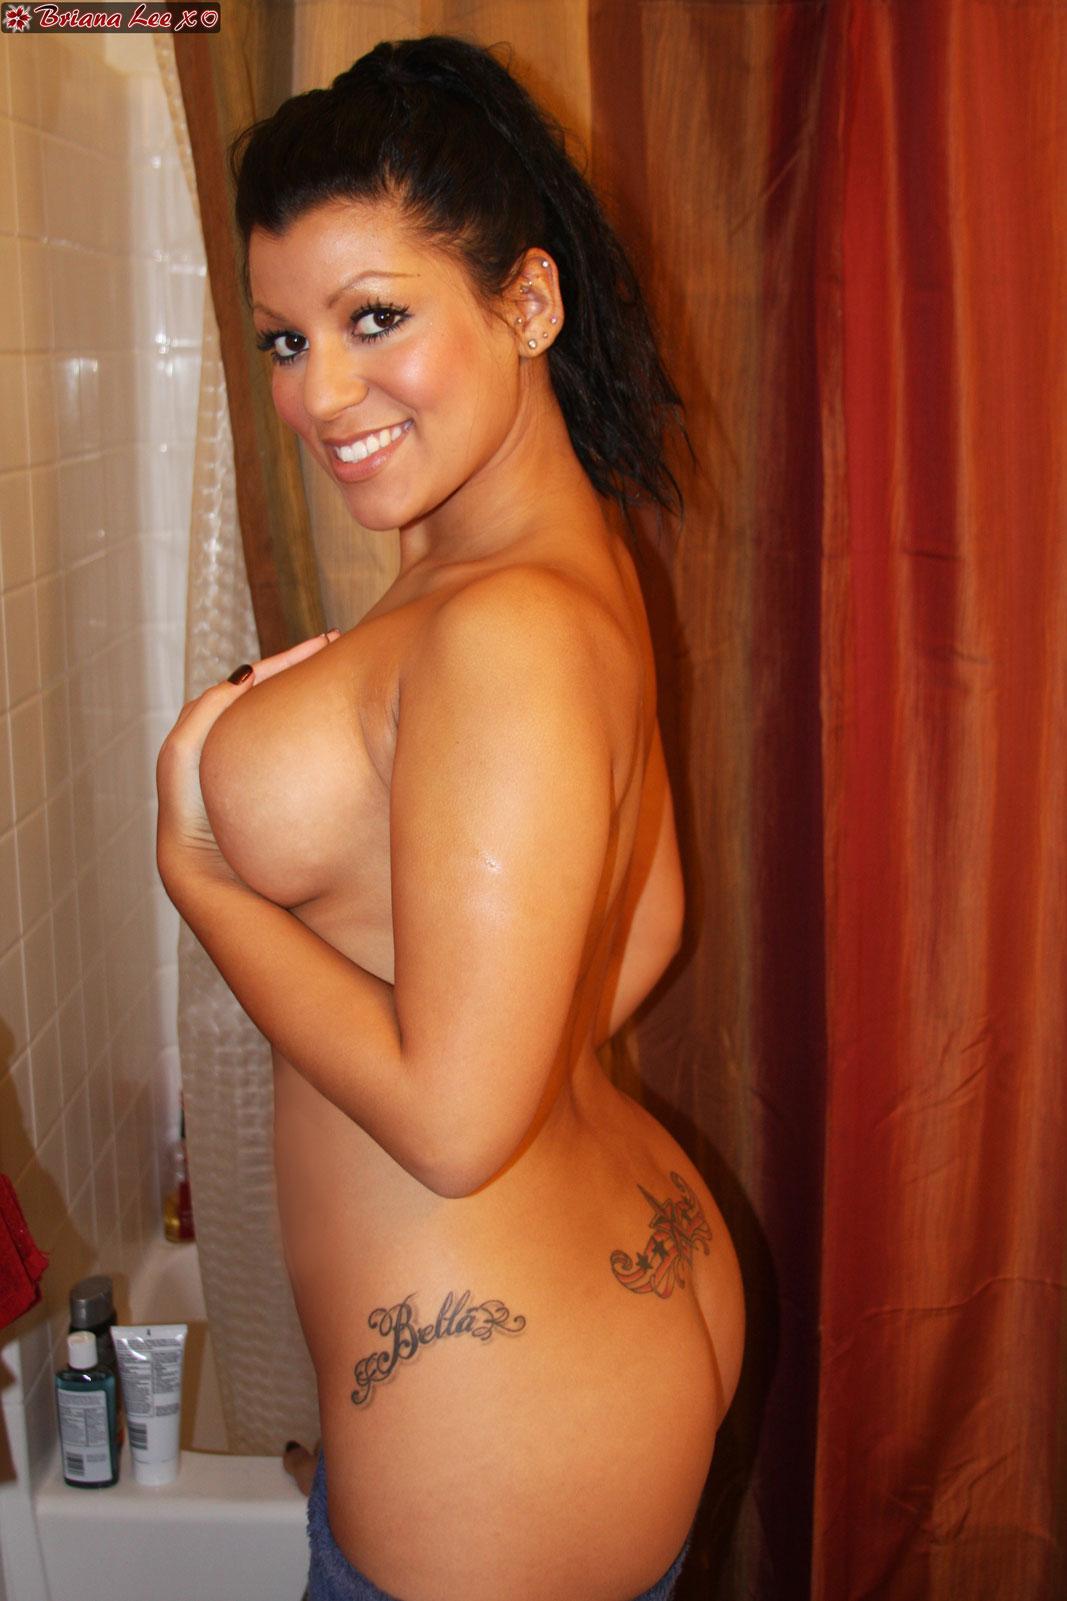 Briana lee shower necessary